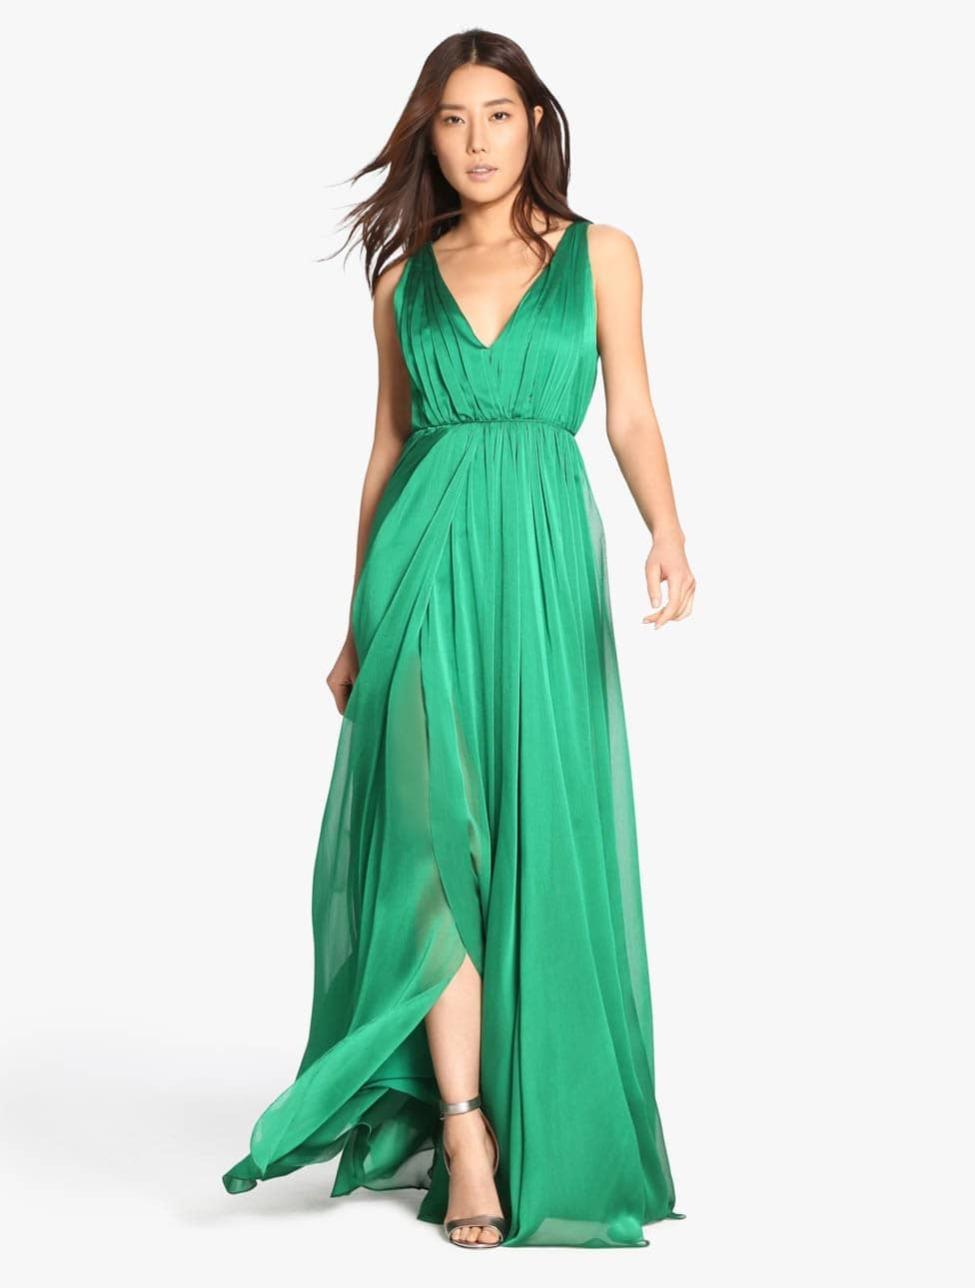 1782554-emerald-main.975w.jpg